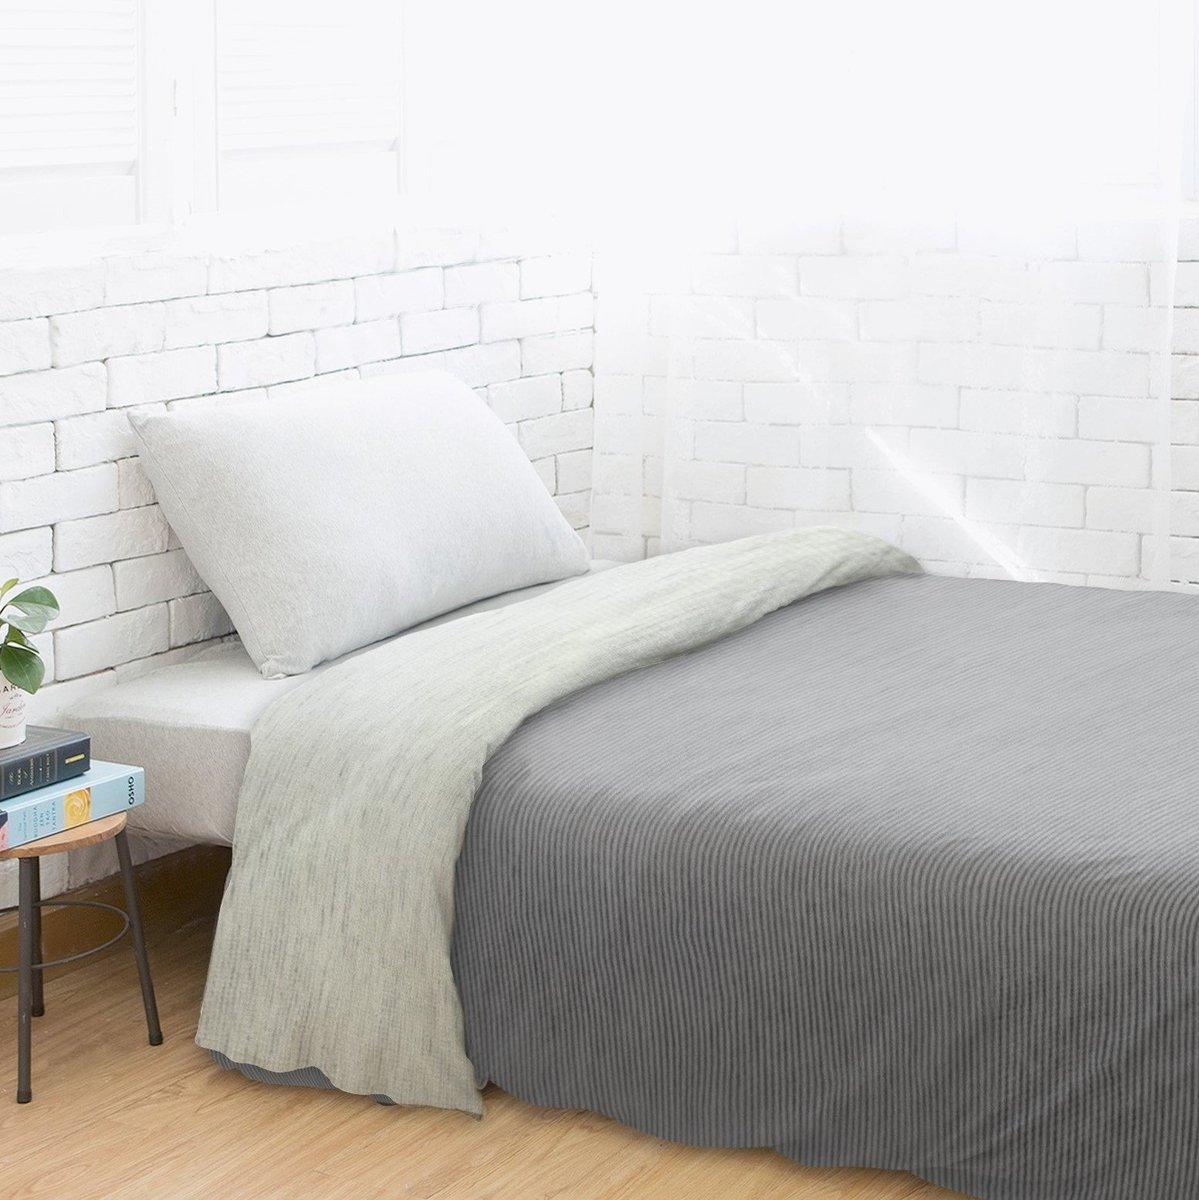 Fine Cotton Knit Duvet Cover-Black gray stripe/Apricot